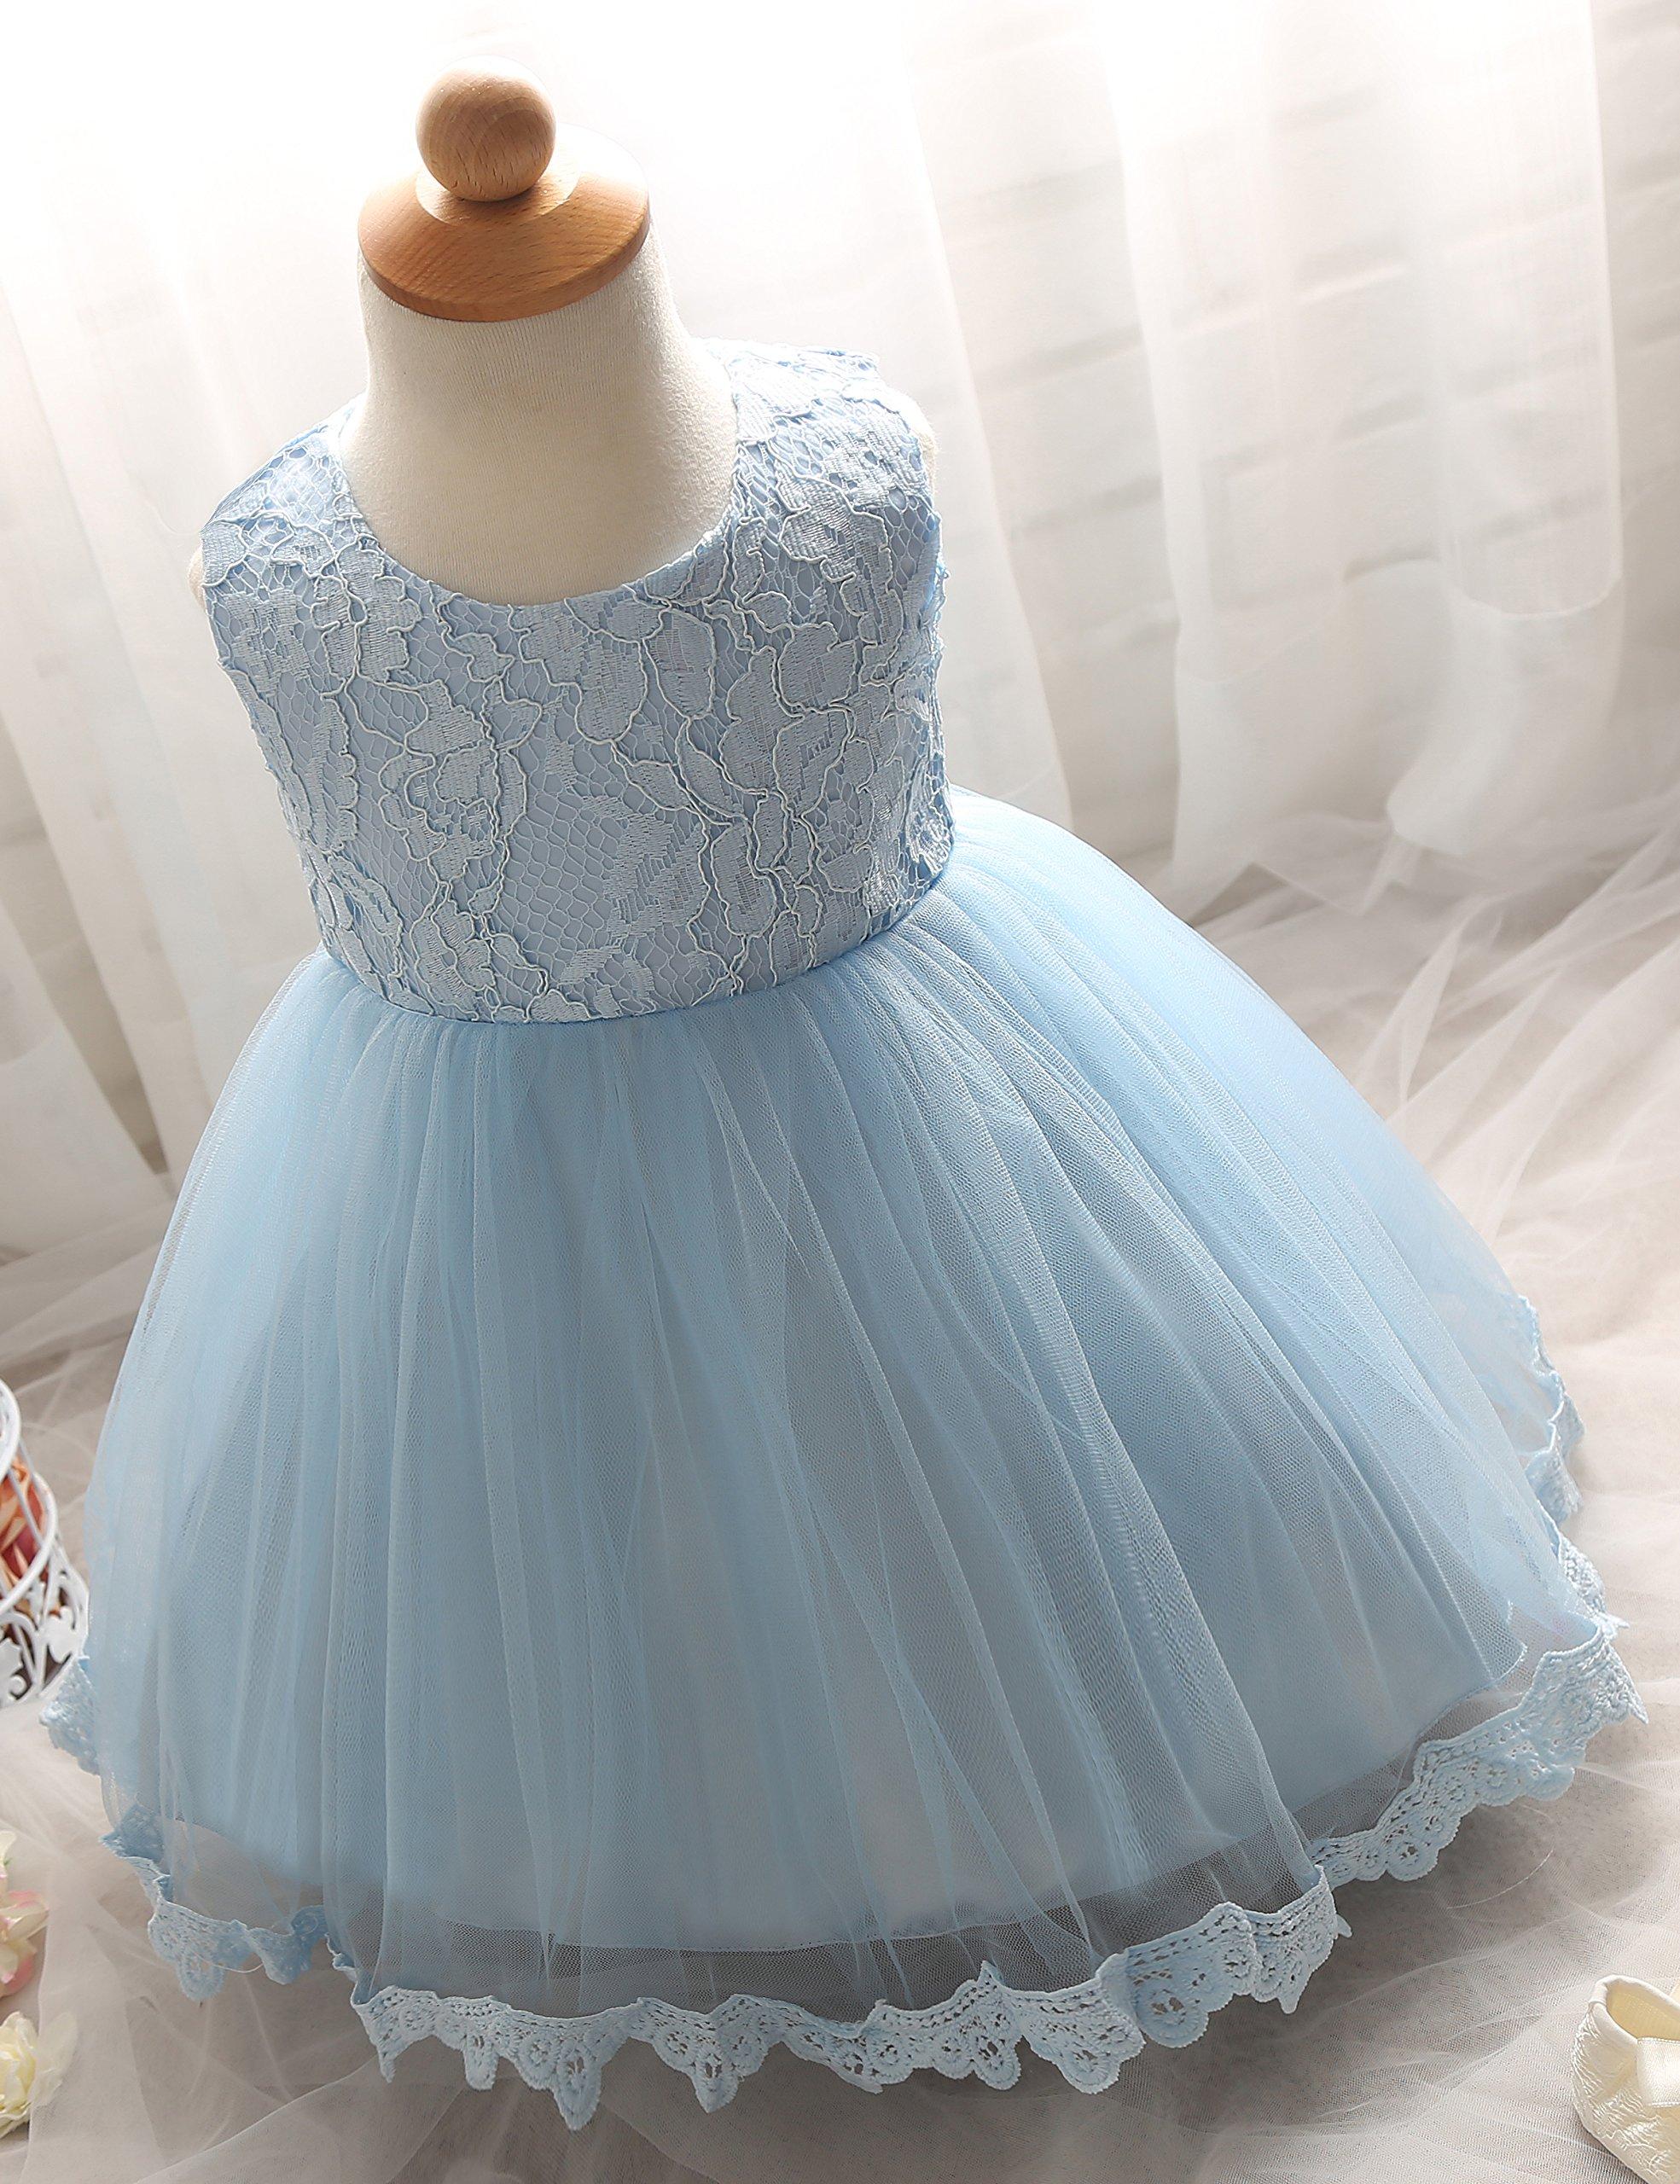 NNJXD Girls\' Tulle Flower Princess Wedding Dress for Toddler and ...